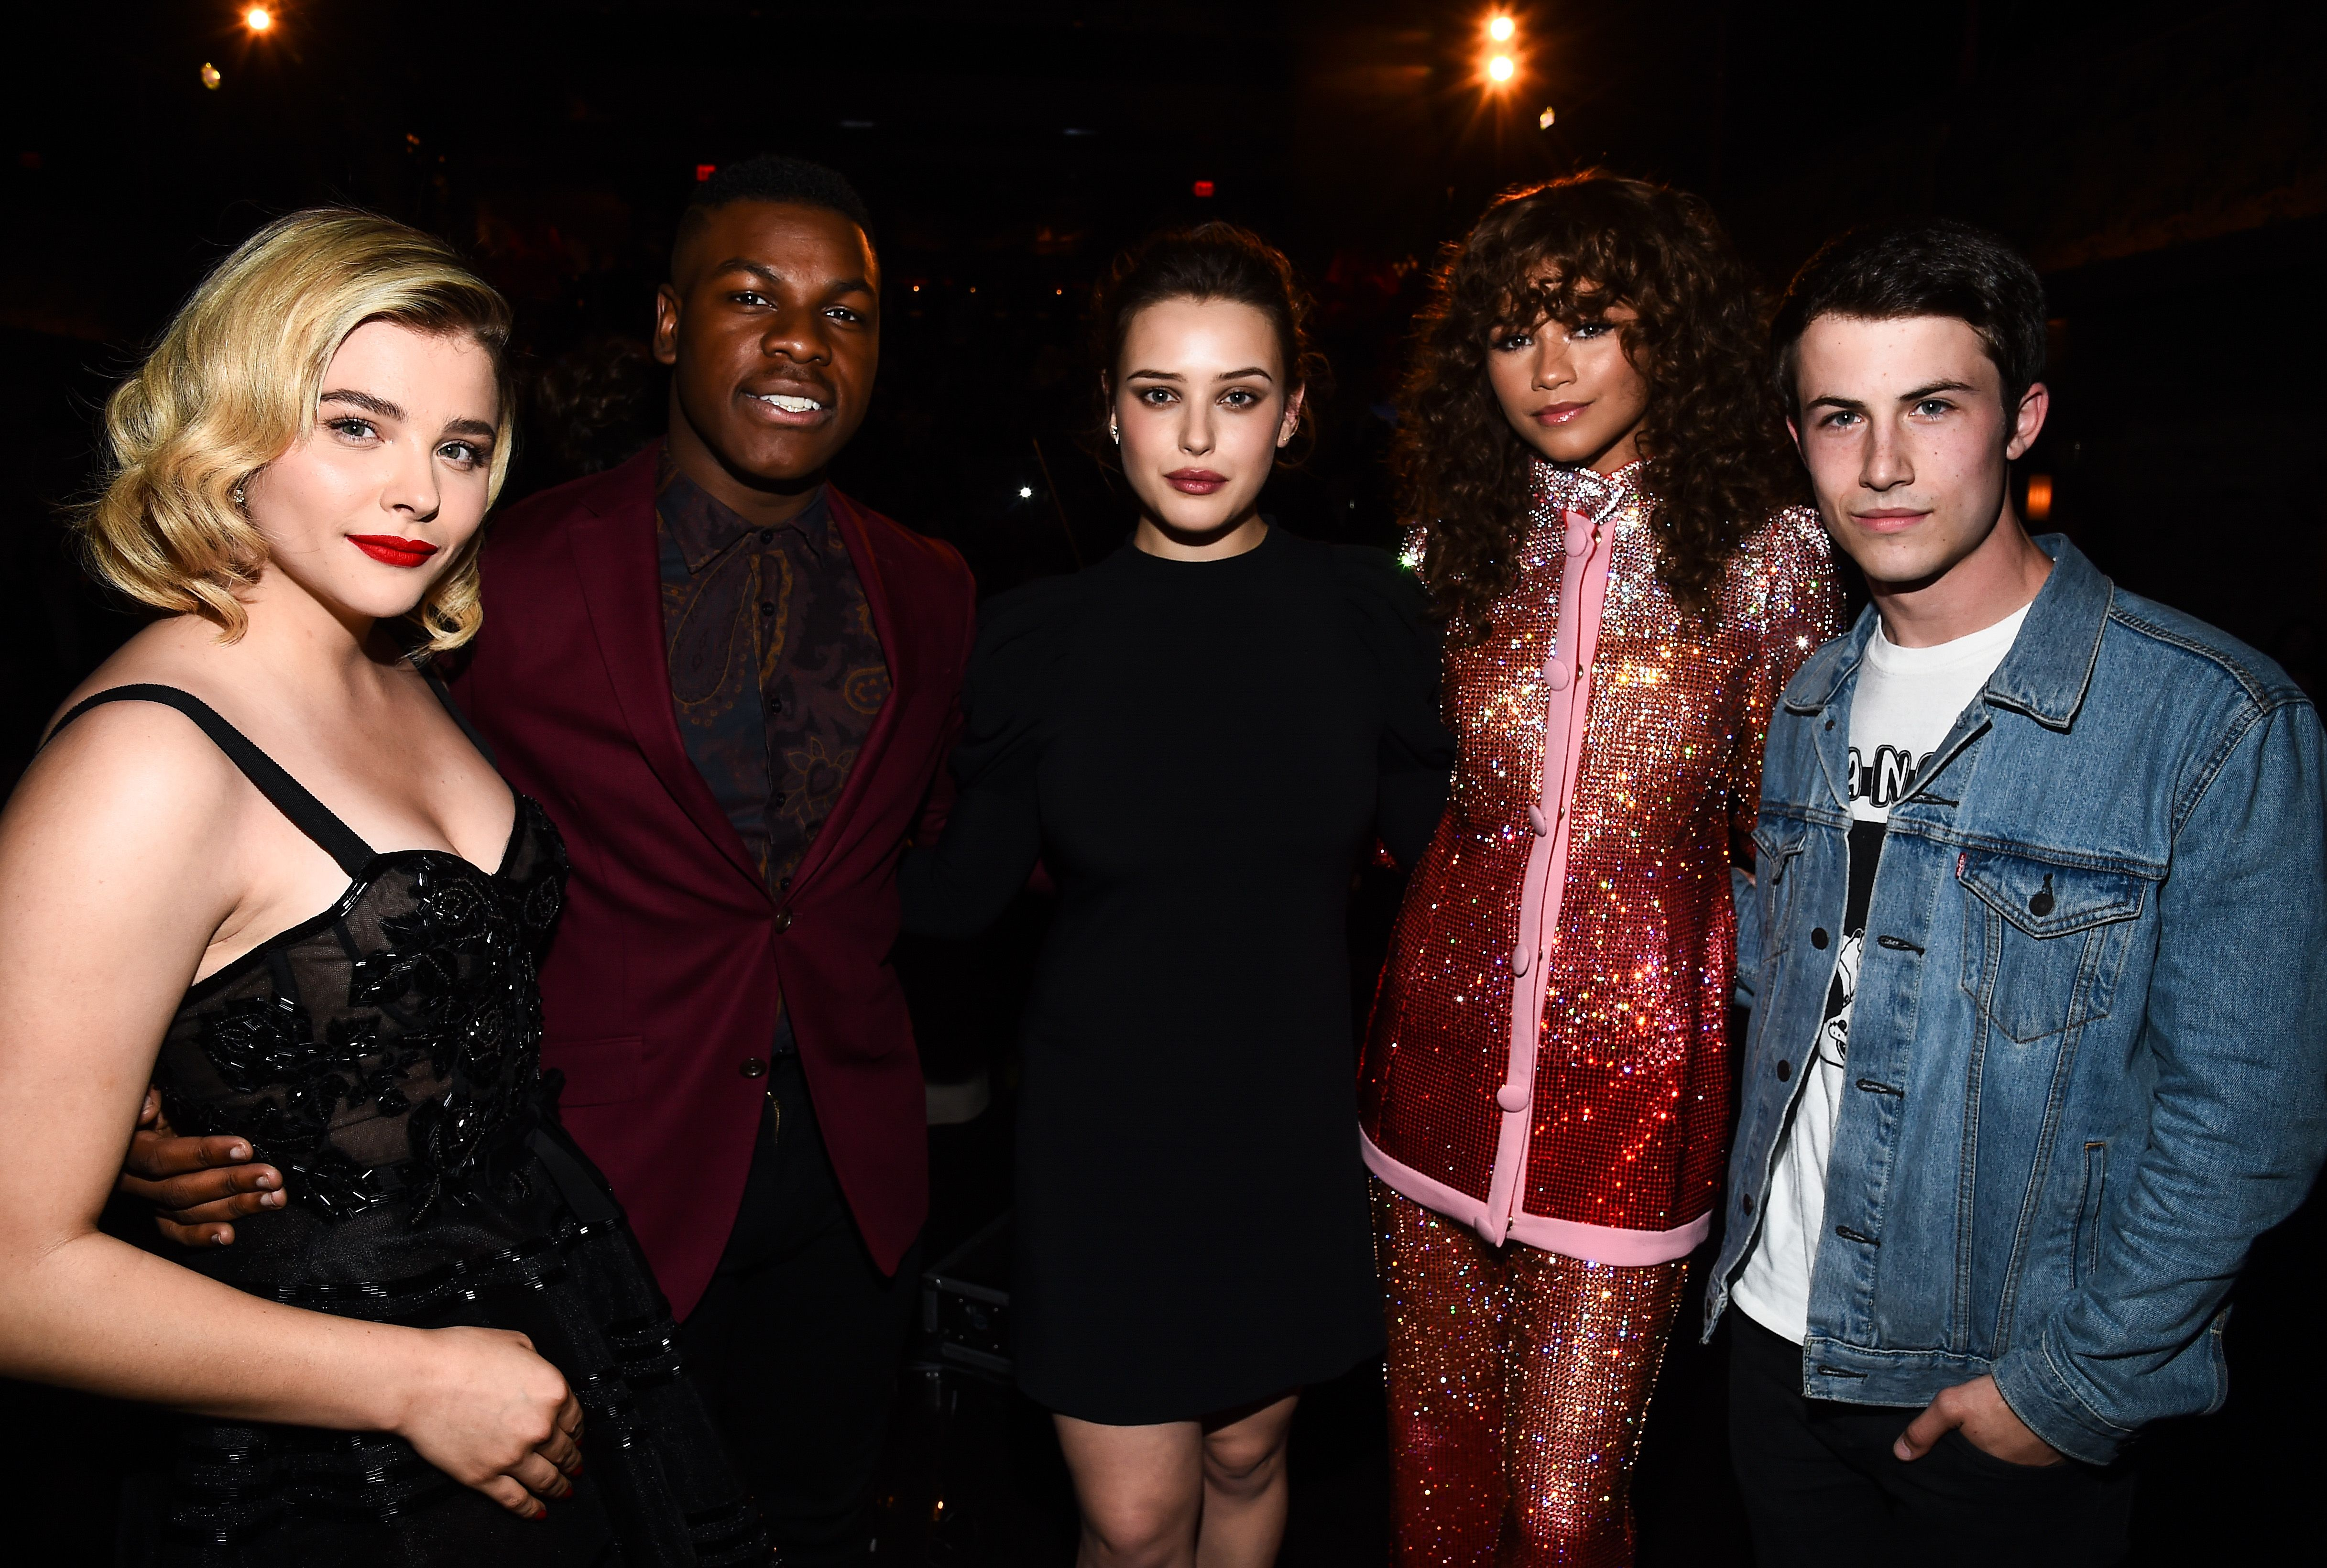 Chloe Grace Moretz, John Boyega, Katherine Langford, Zendaya and Dylan MinnetteVariety's Power of Young Hollywood, Inside, Los Angeles, USA - 08 Aug 2017